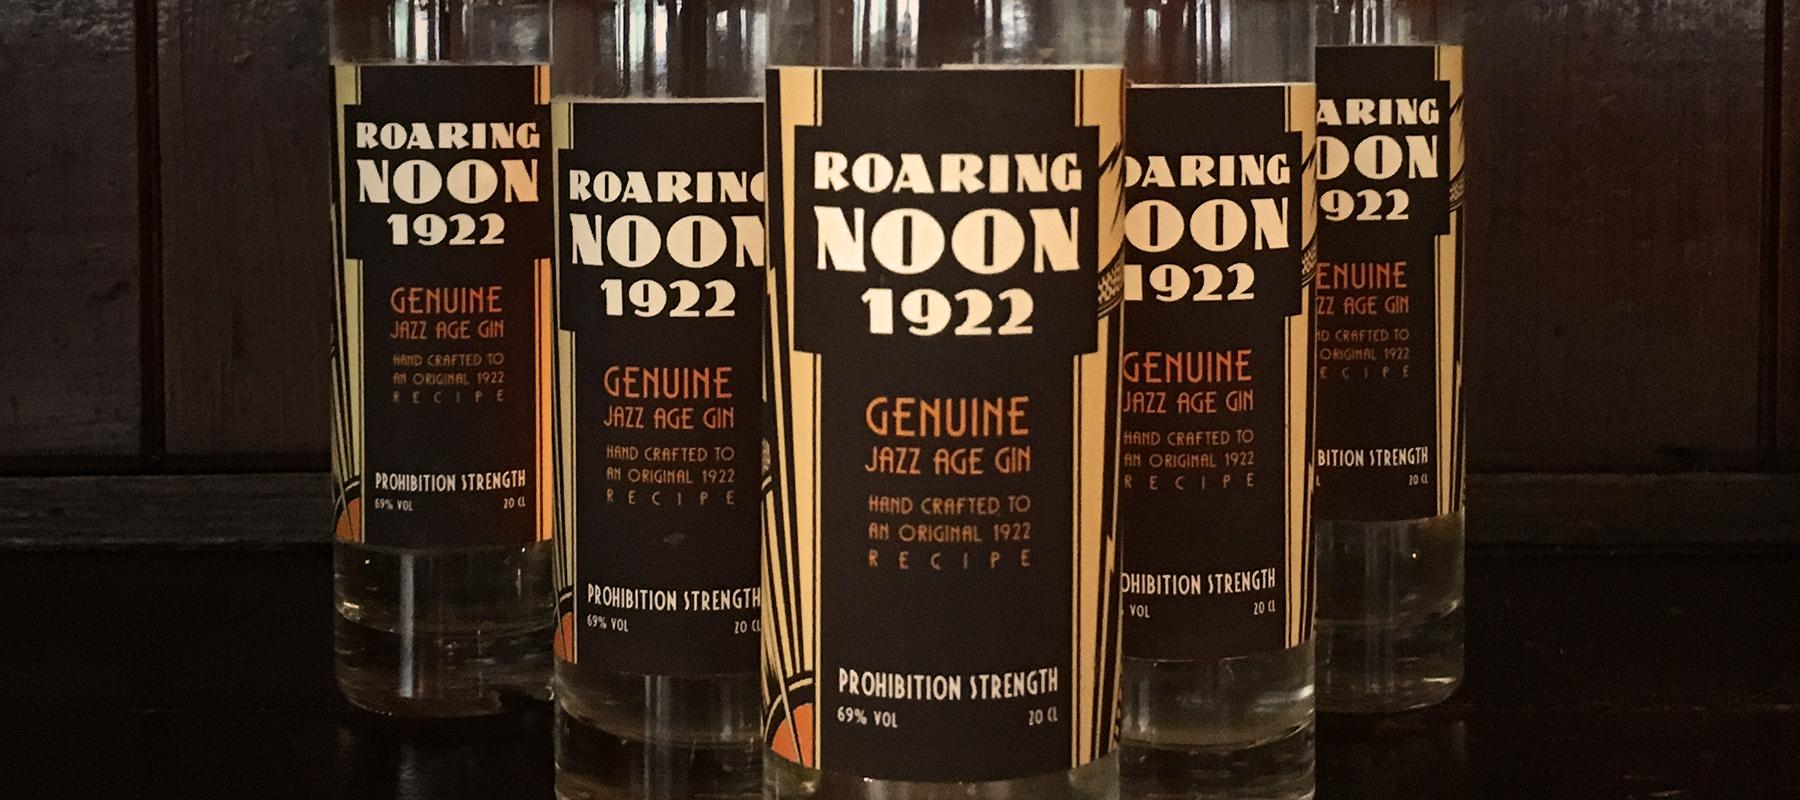 Roaring Noon